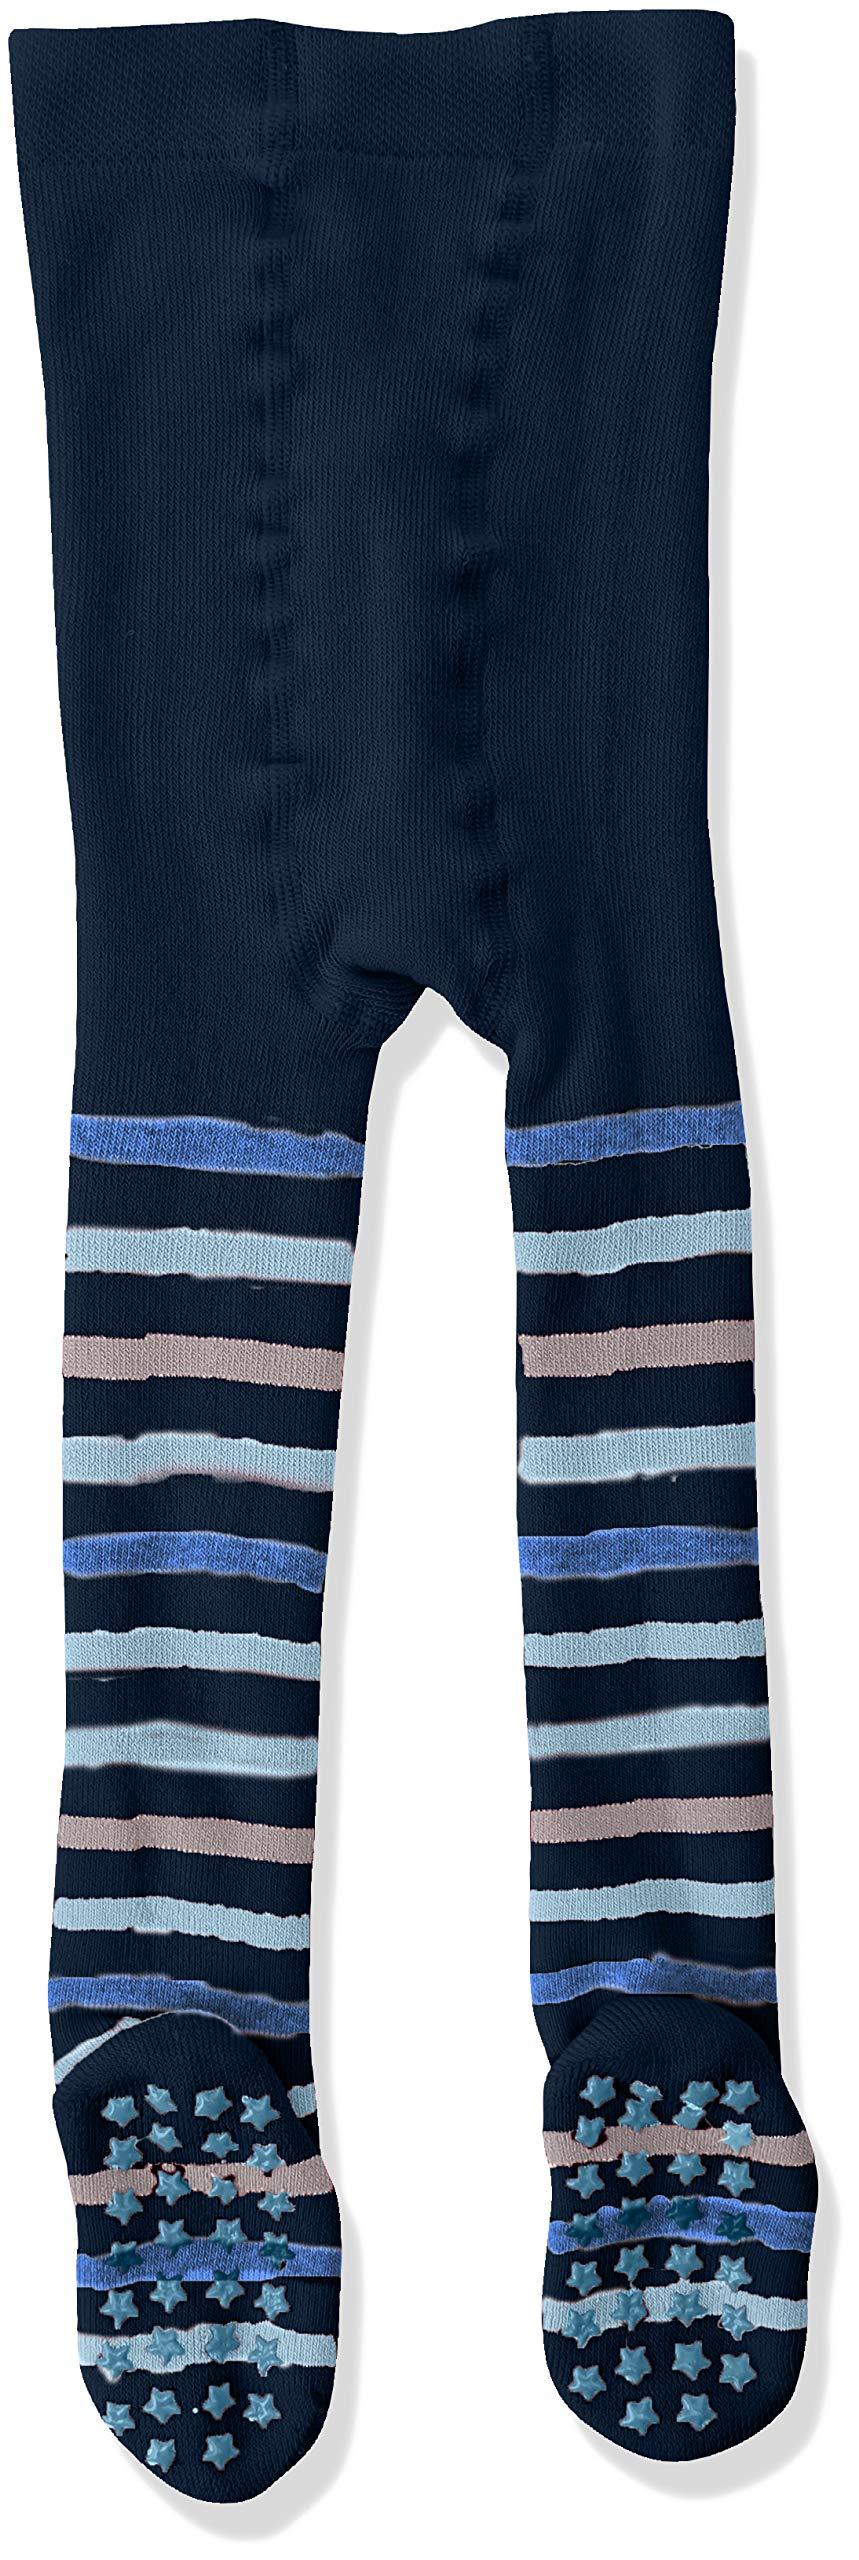 Falke Multi Stripe Calcetines para Bebés 4